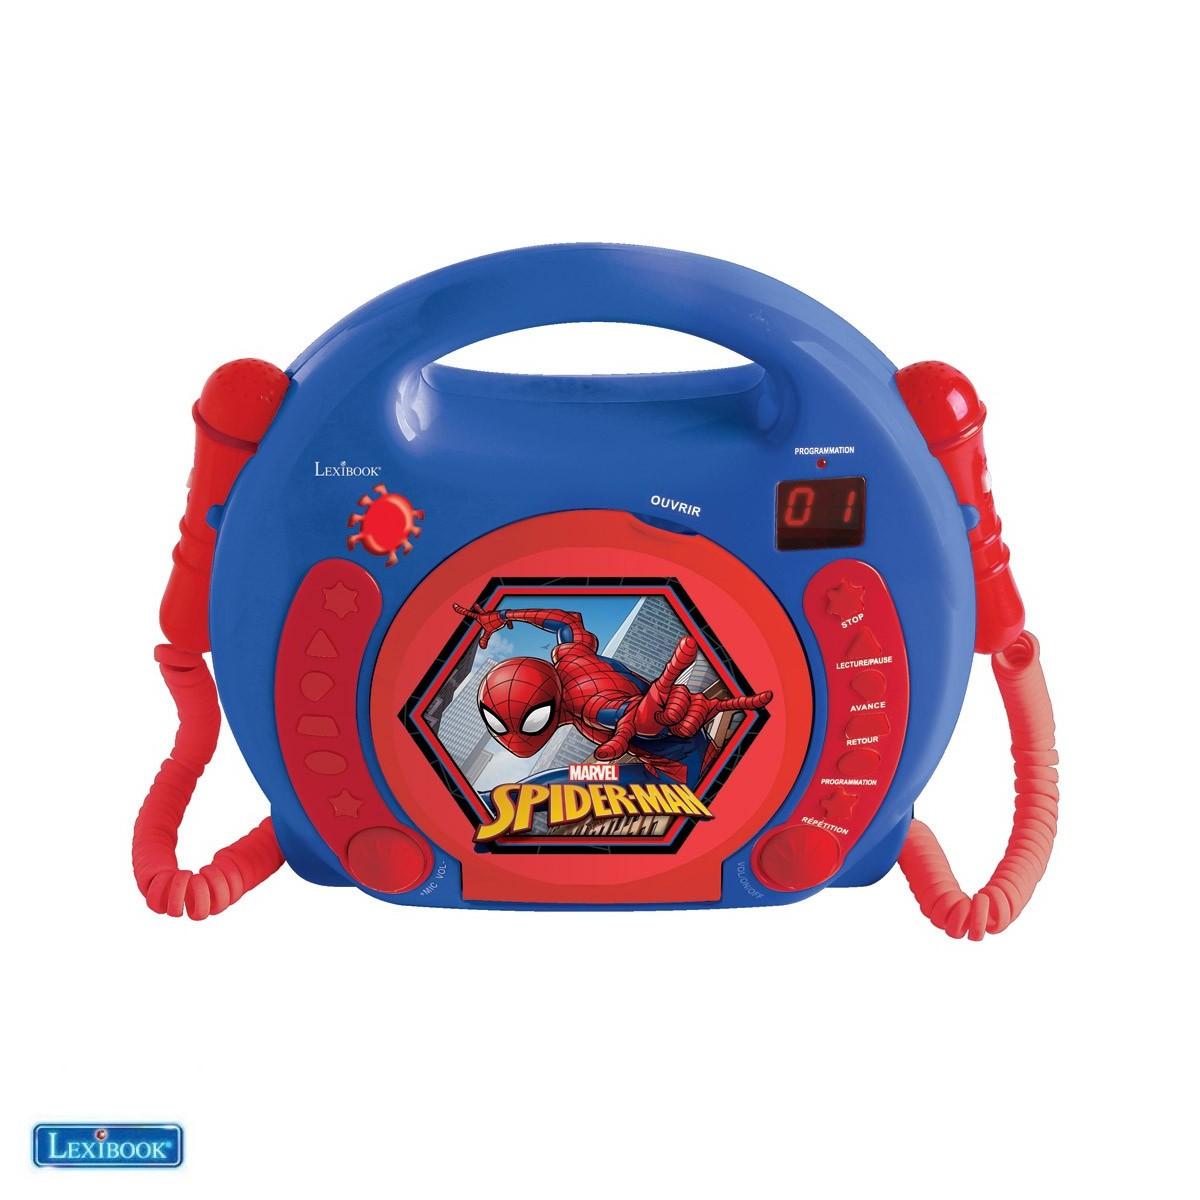 Lecteur CD avec microphones Spiderman - Lexibook